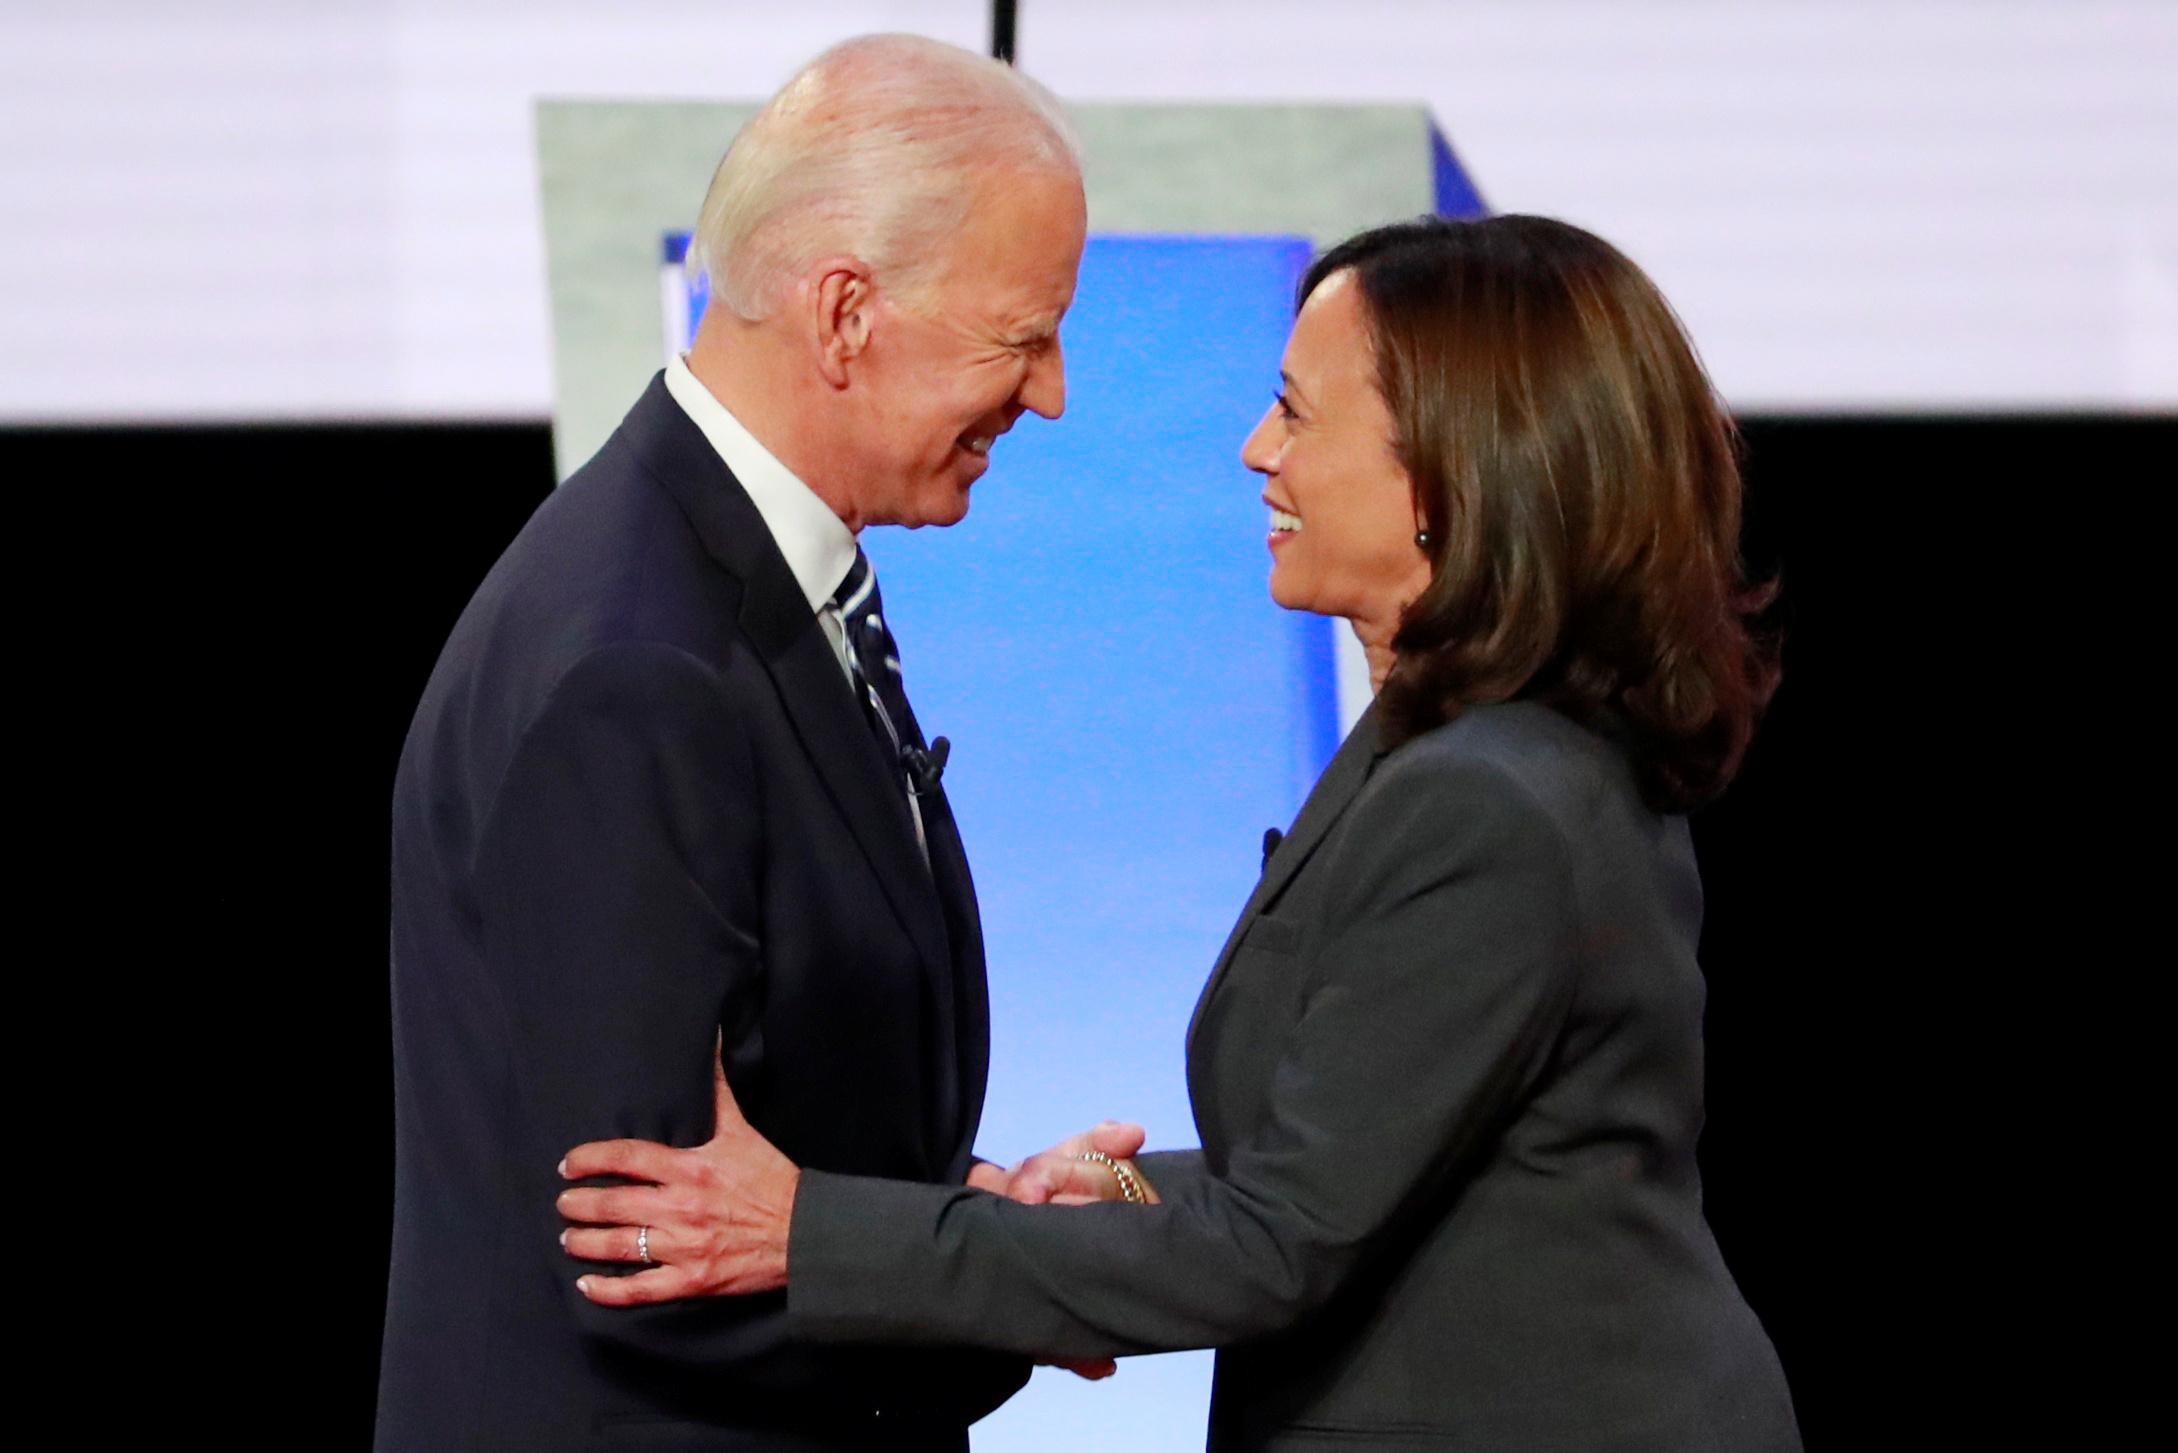 Joe Biden, candidato democrata à presidência, ao lado da senadora Kamala Harris